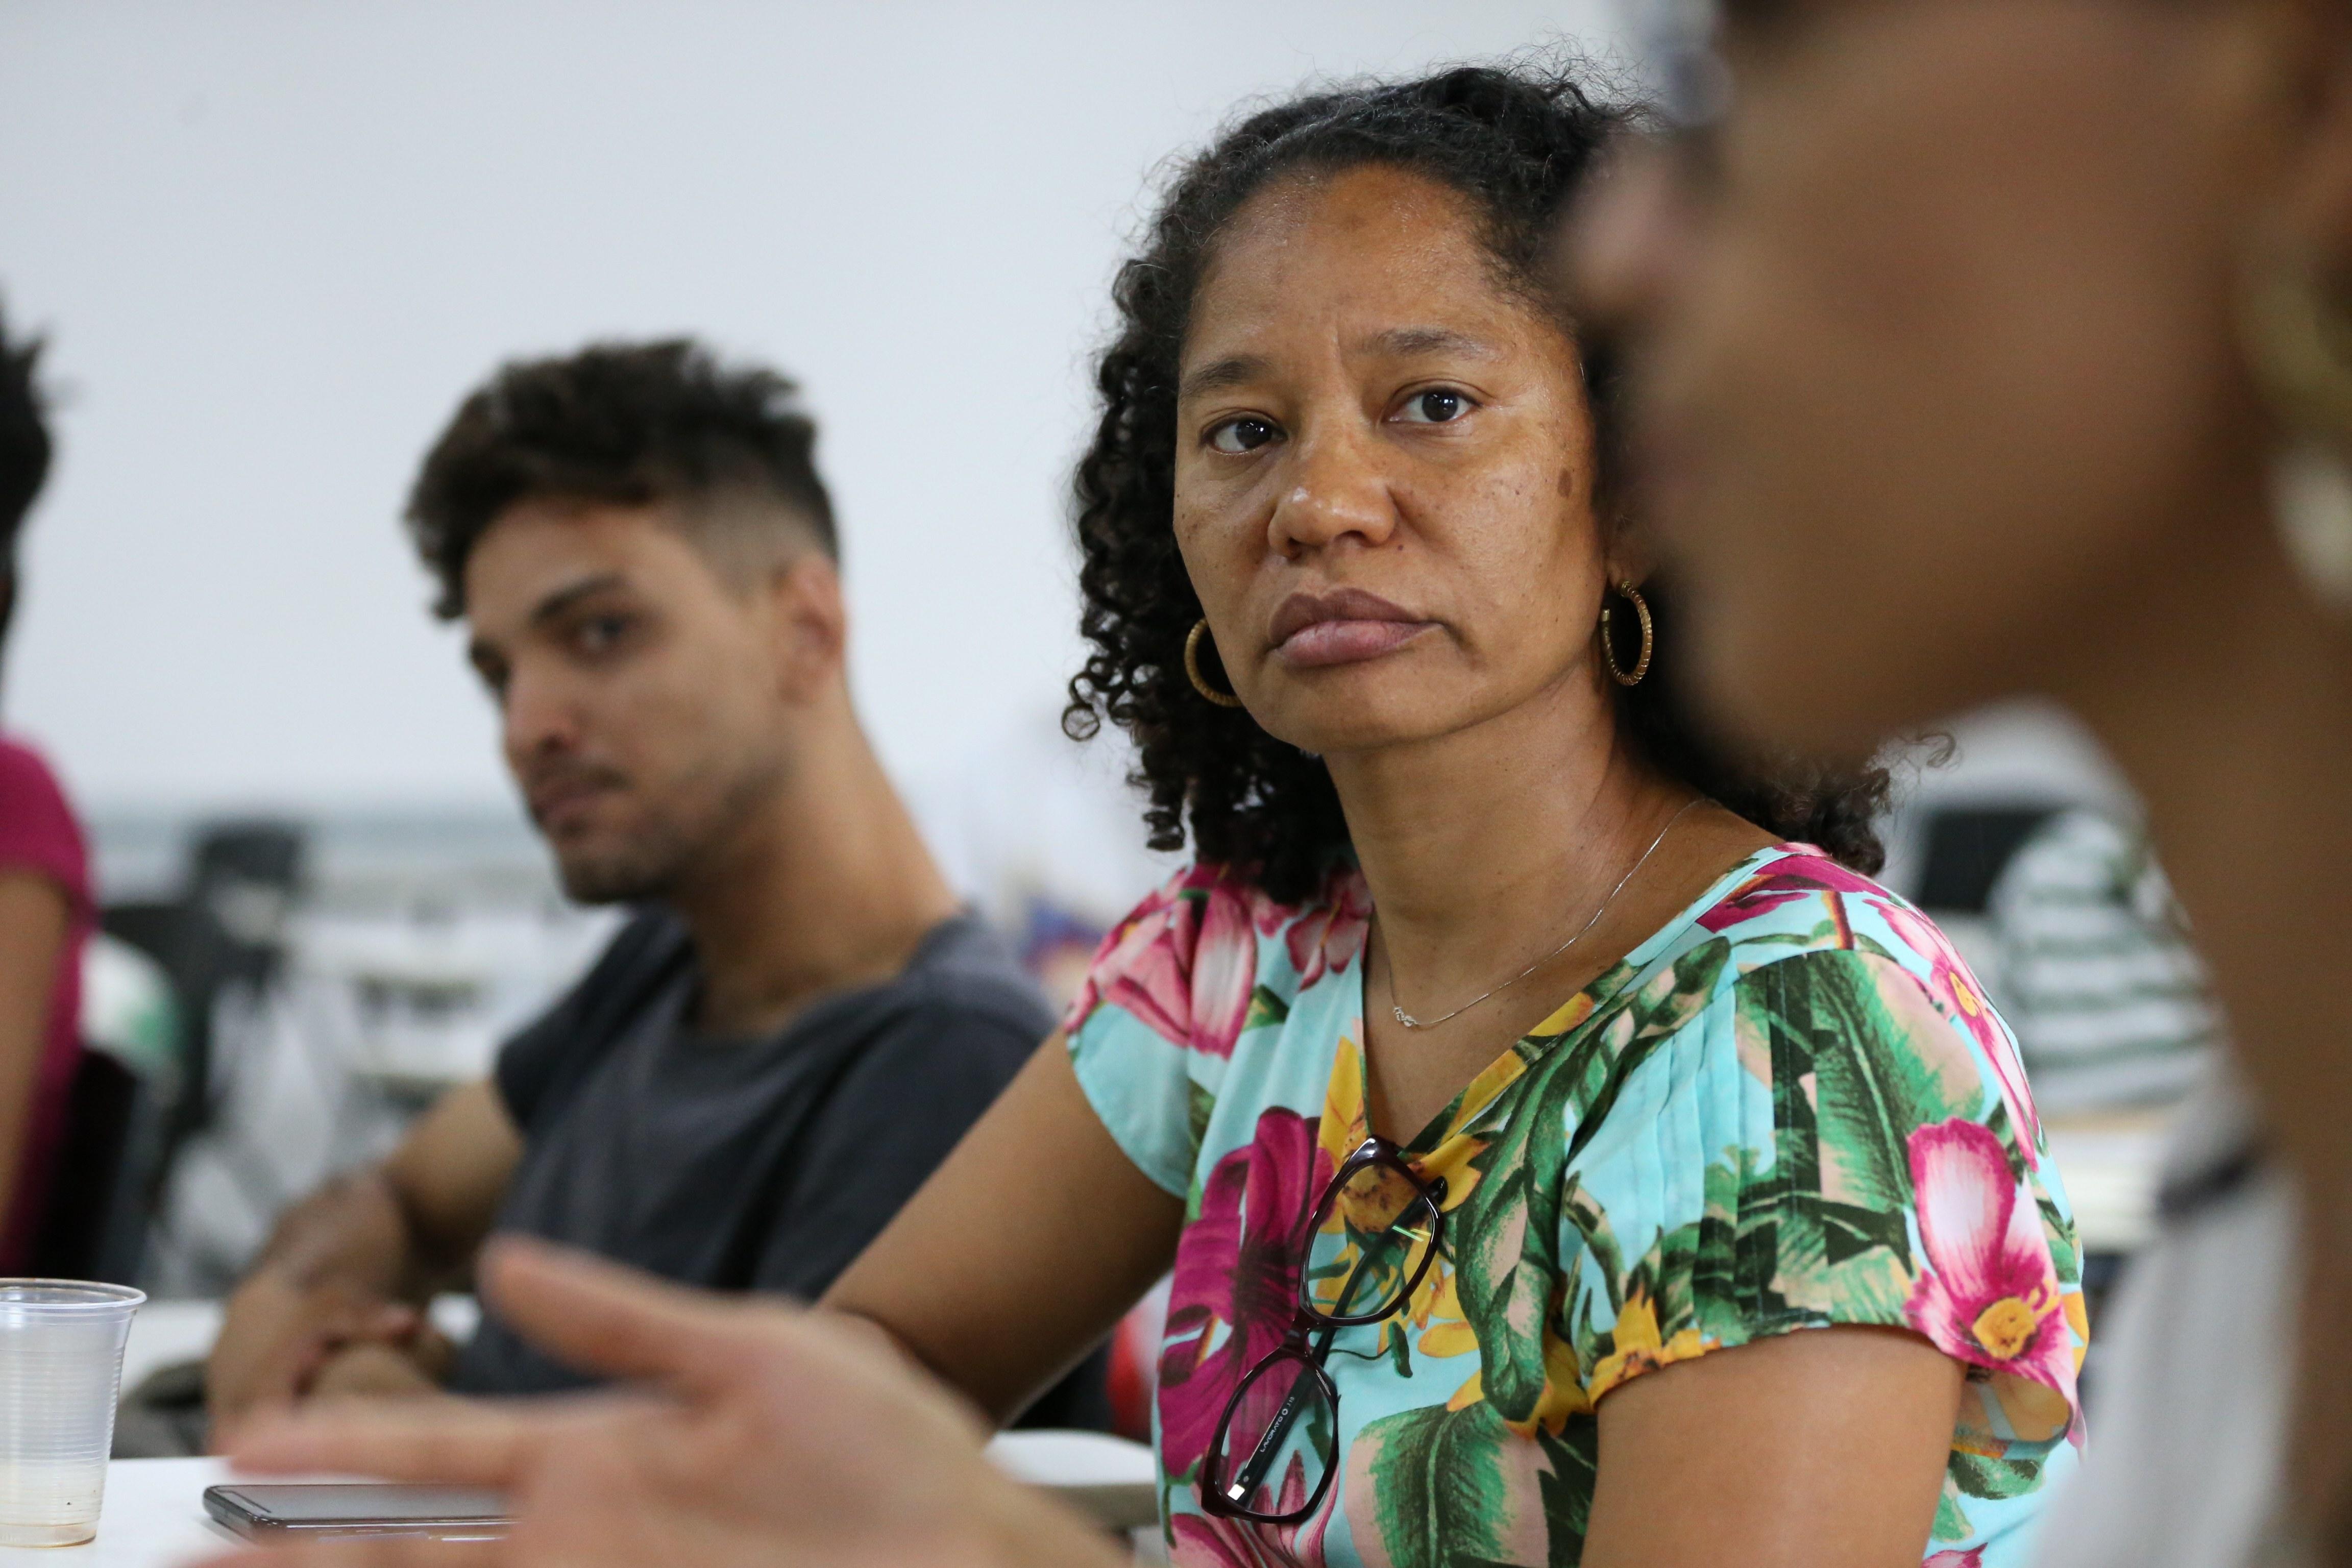 Angela Maria de Souza